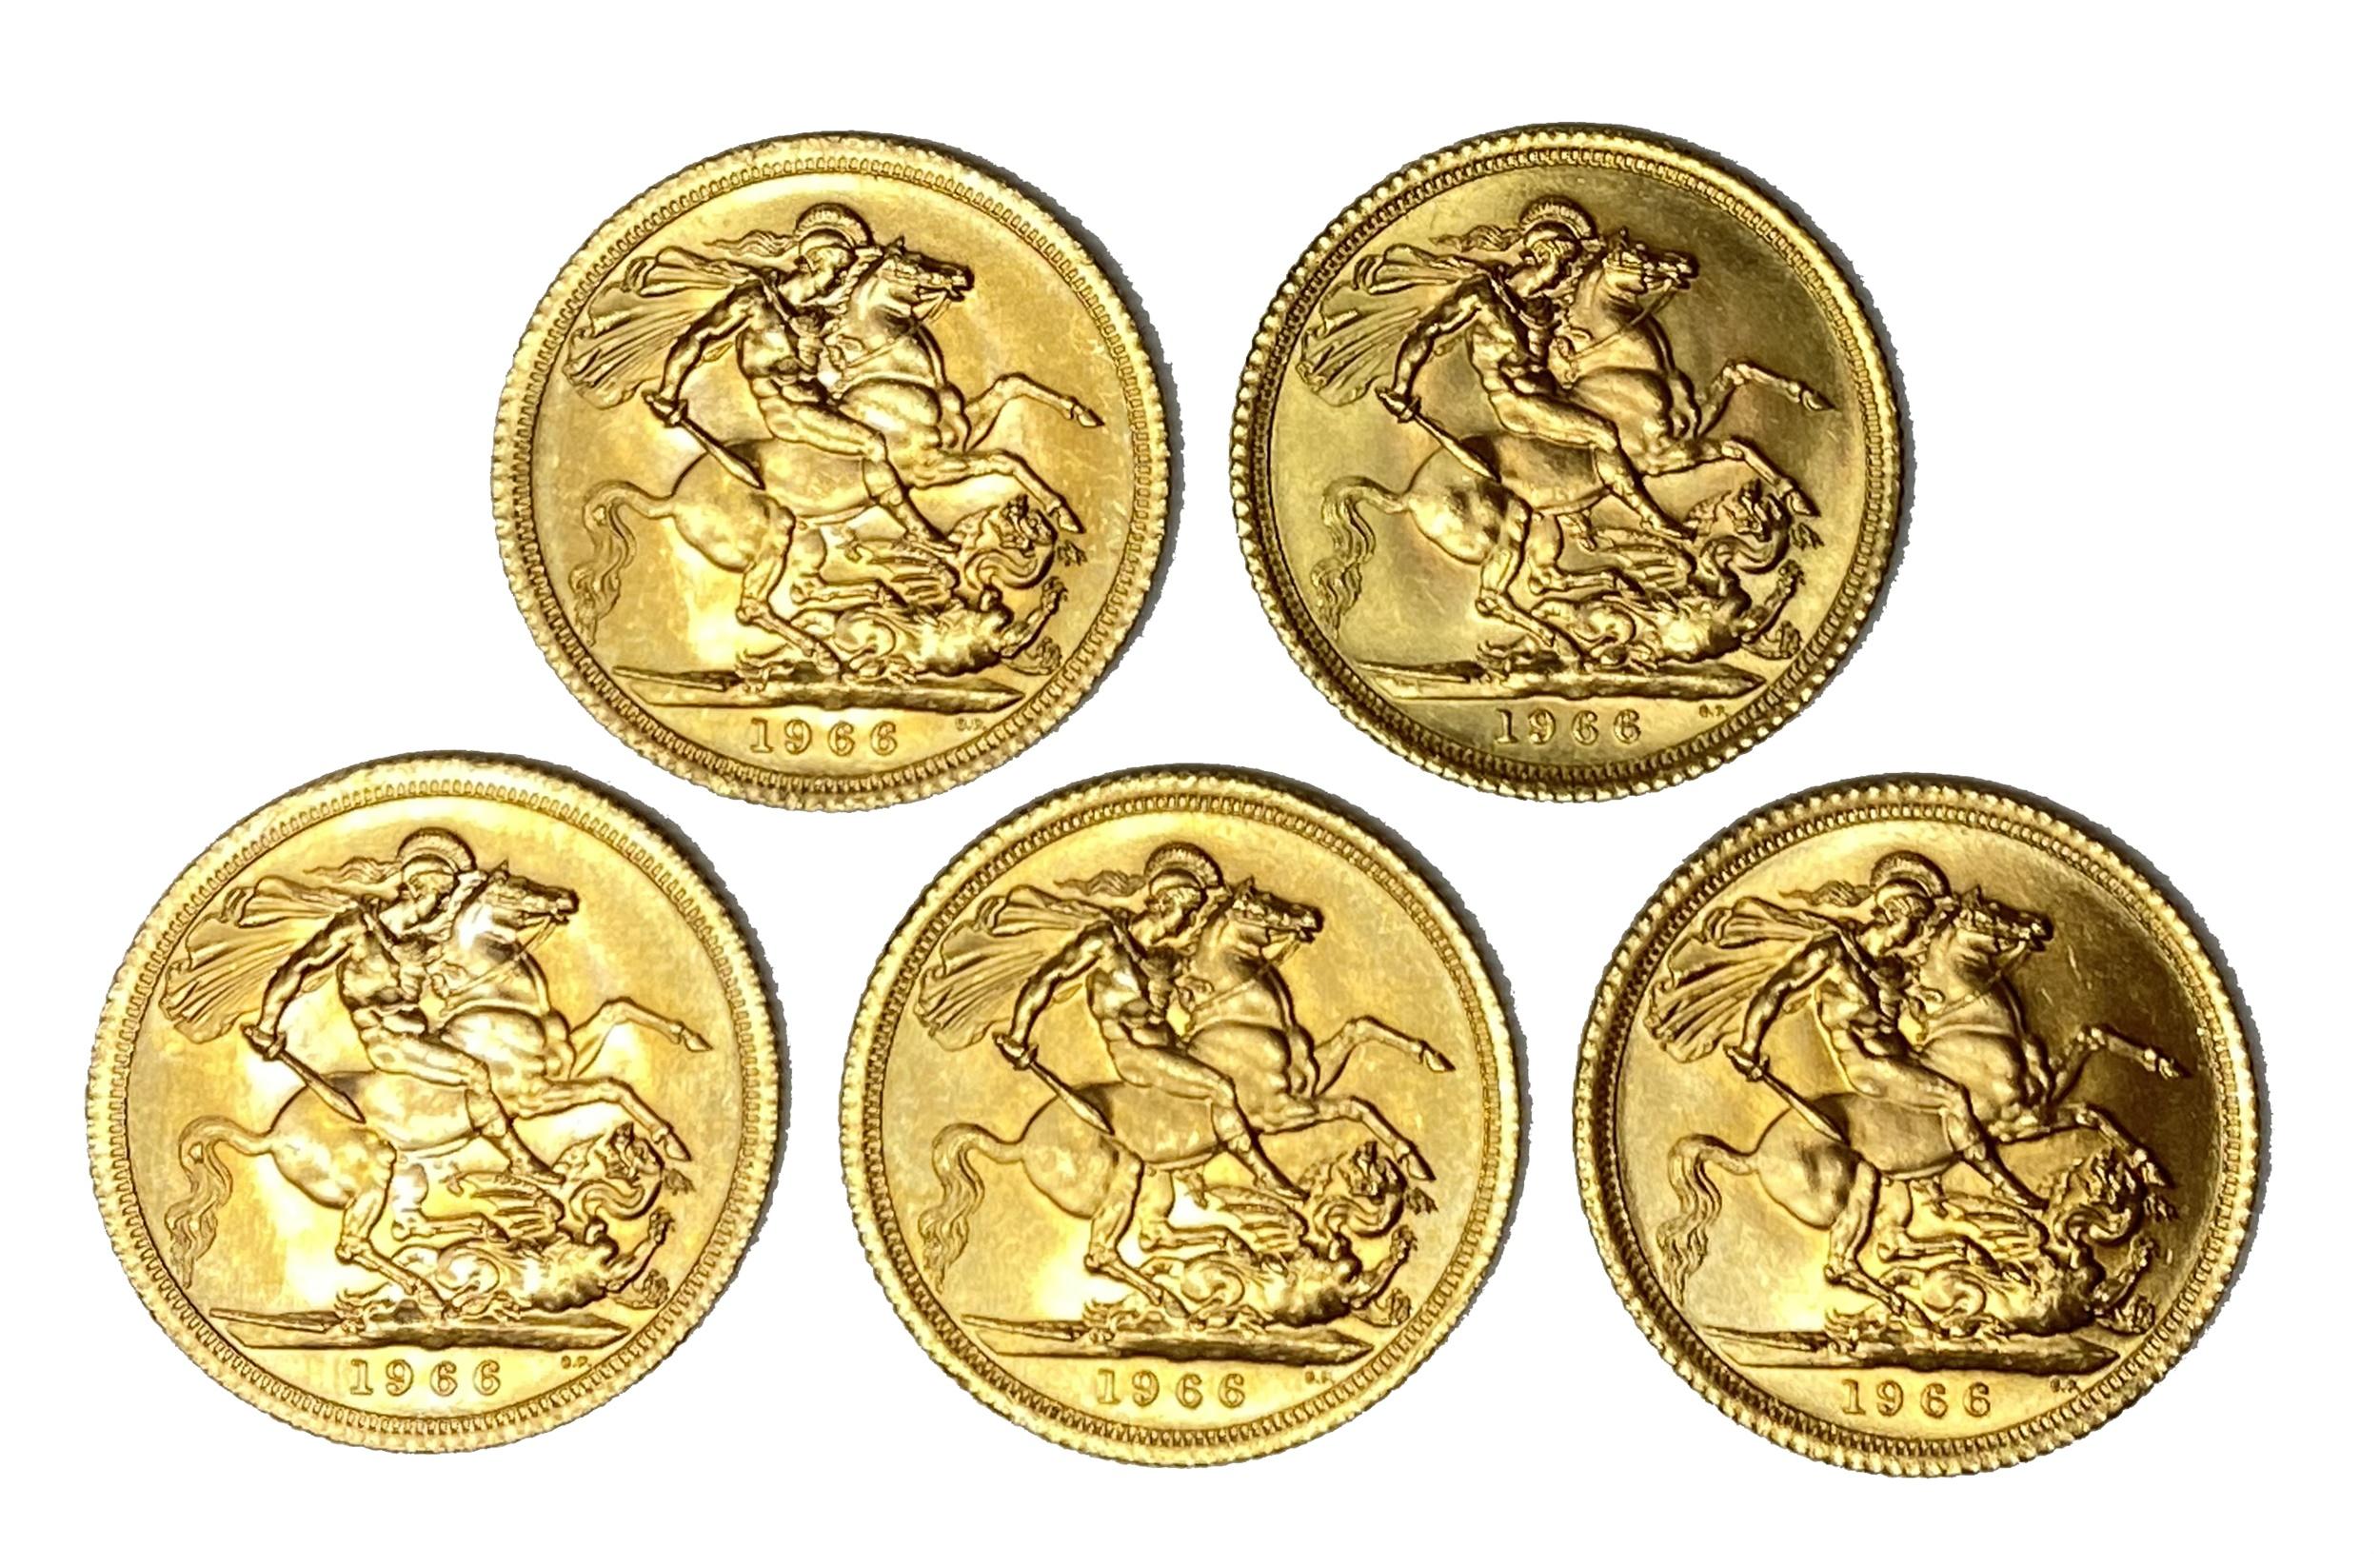 Elizabeth II five gold Sovereign coins, 1966 - Image 2 of 2